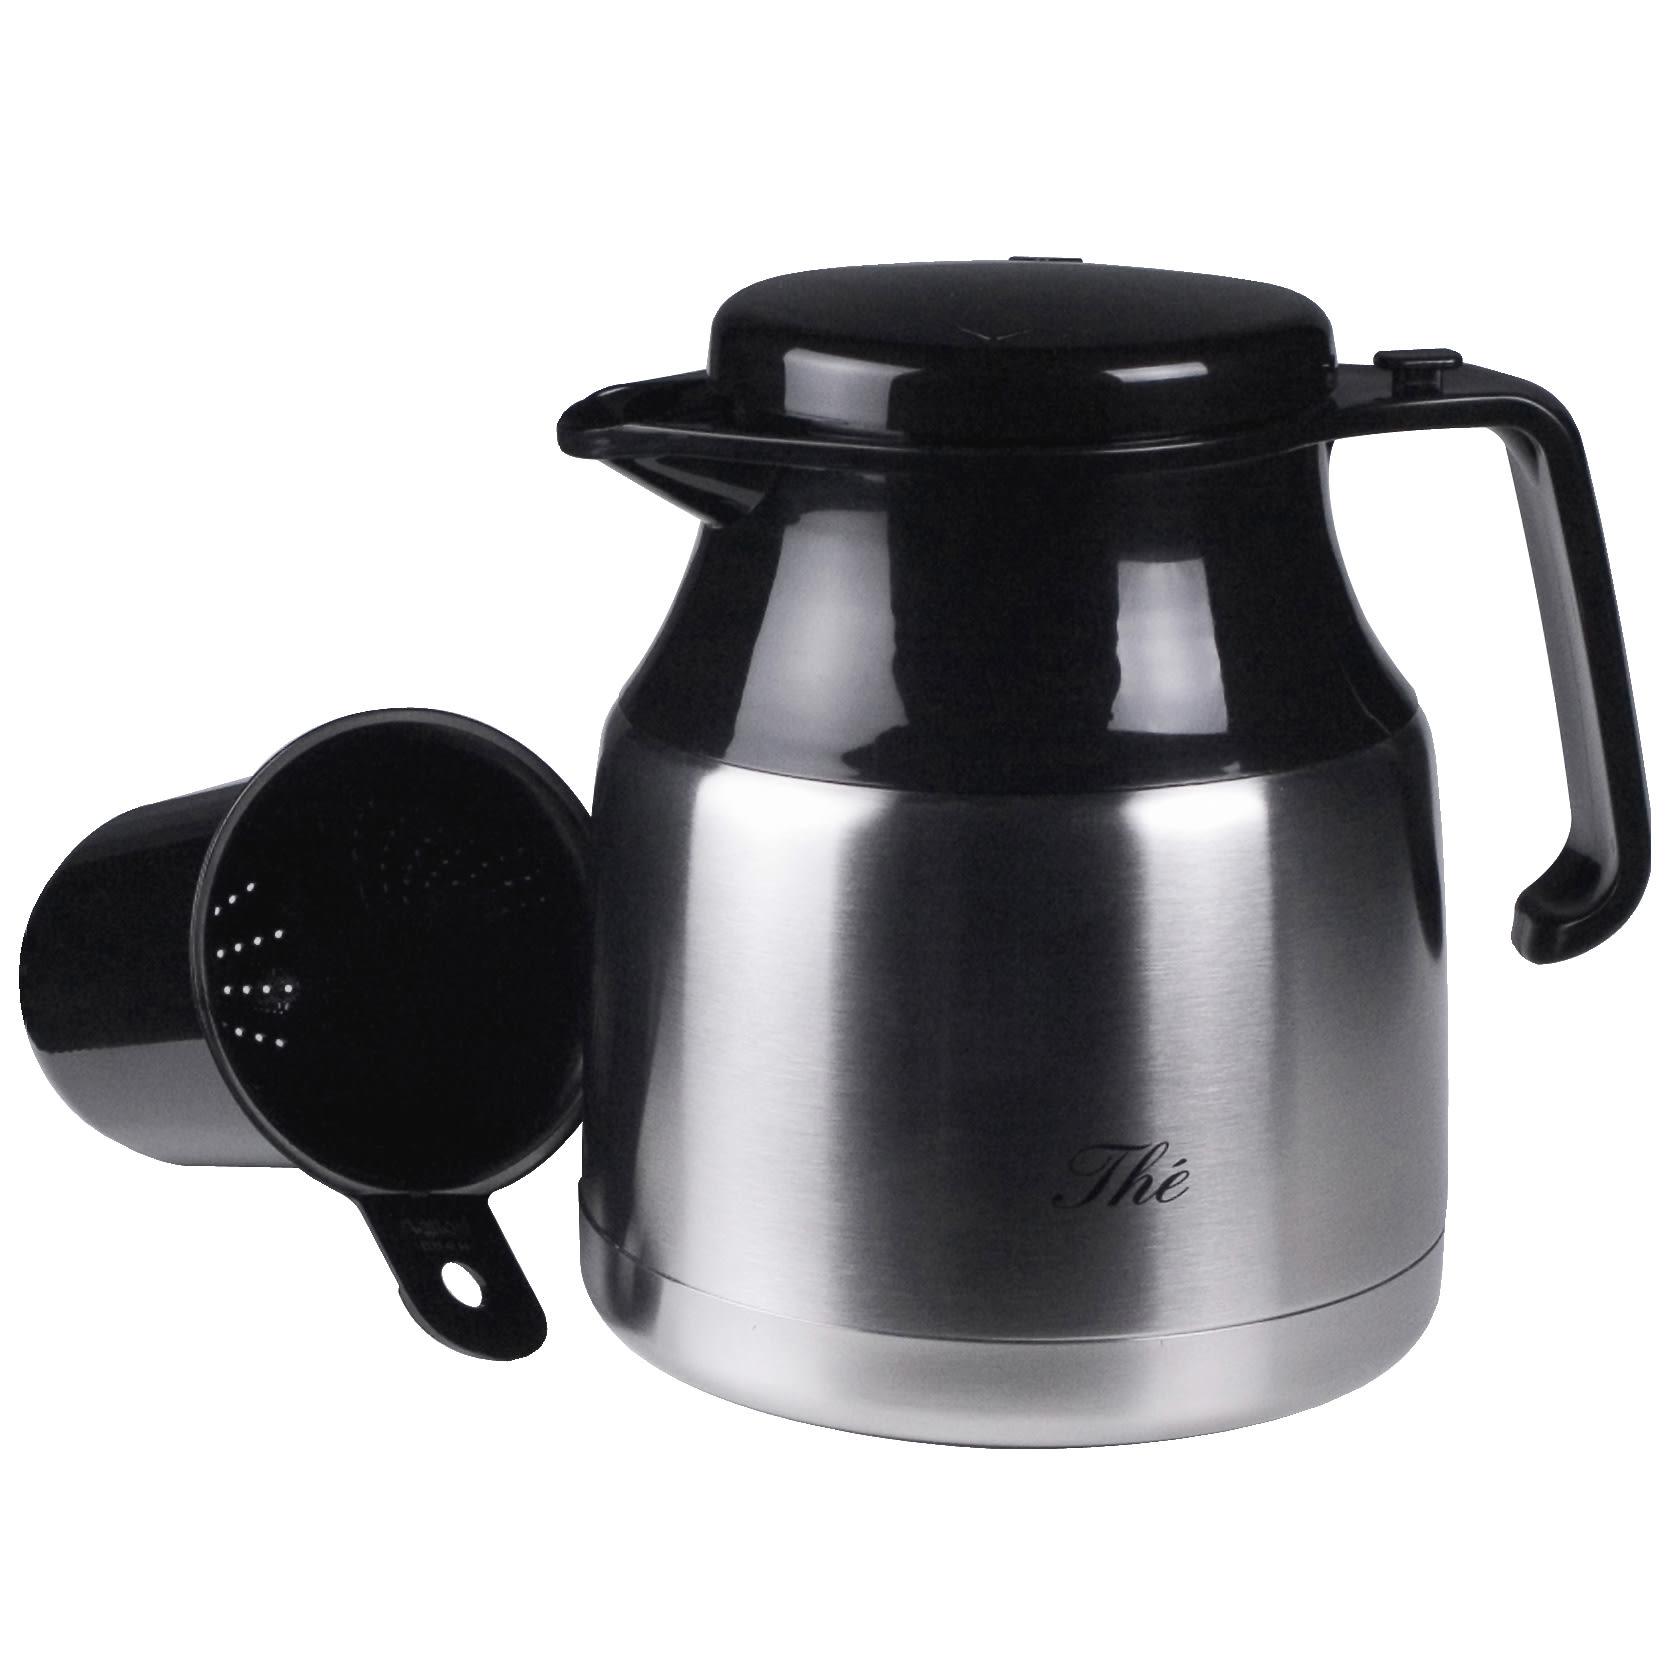 The - 1,3 liter